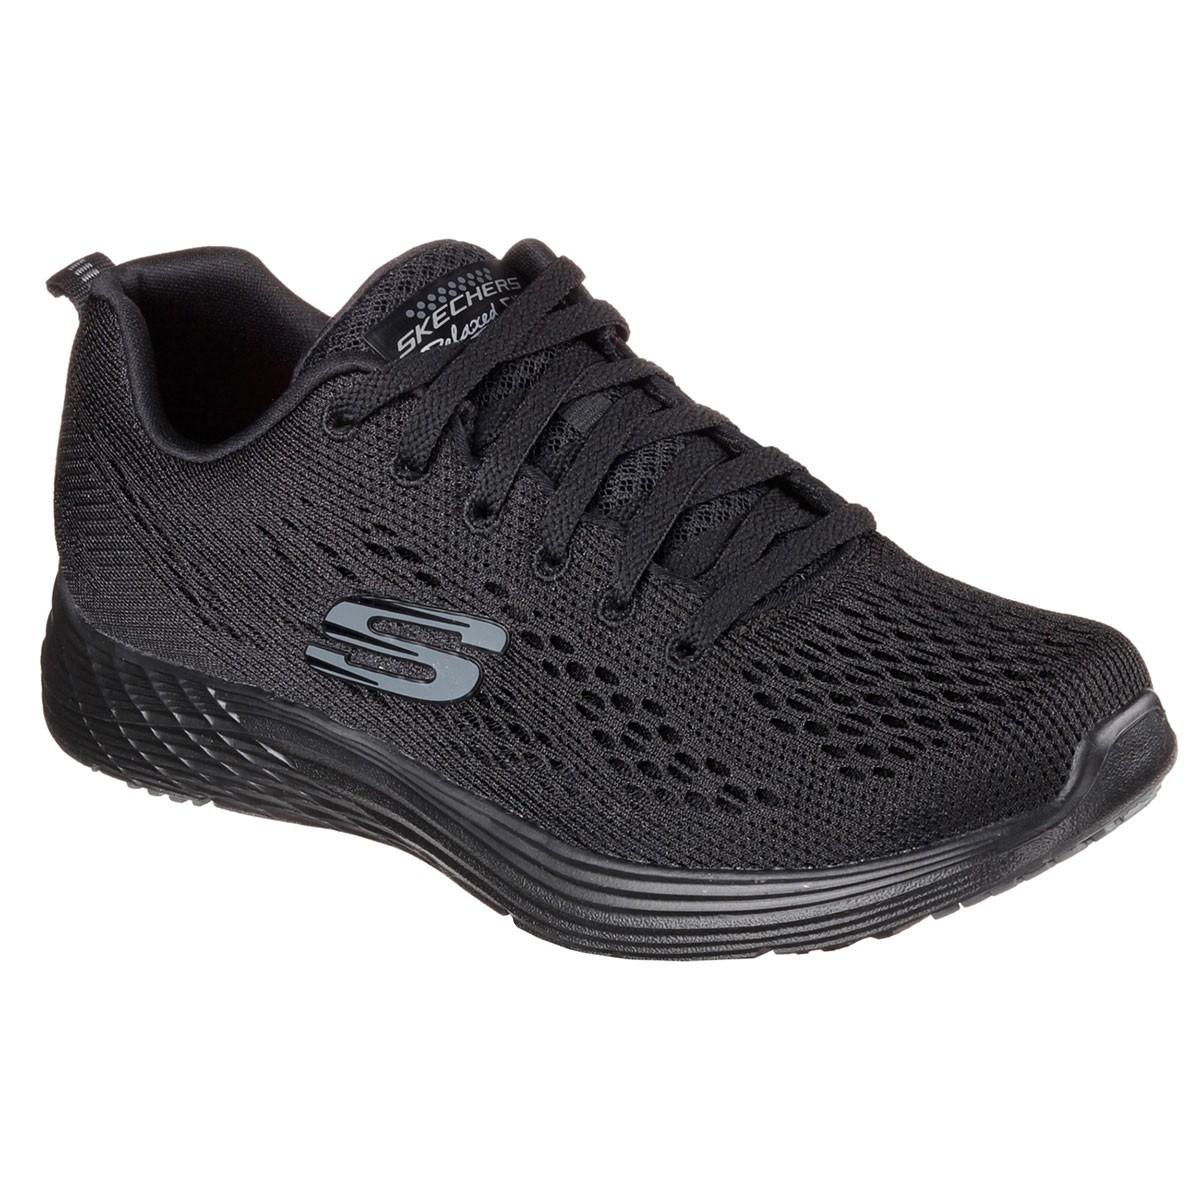 47e8583c4d61 Skechers Womens Valeris - Backstage Pass Running Shoes - Footwear ...